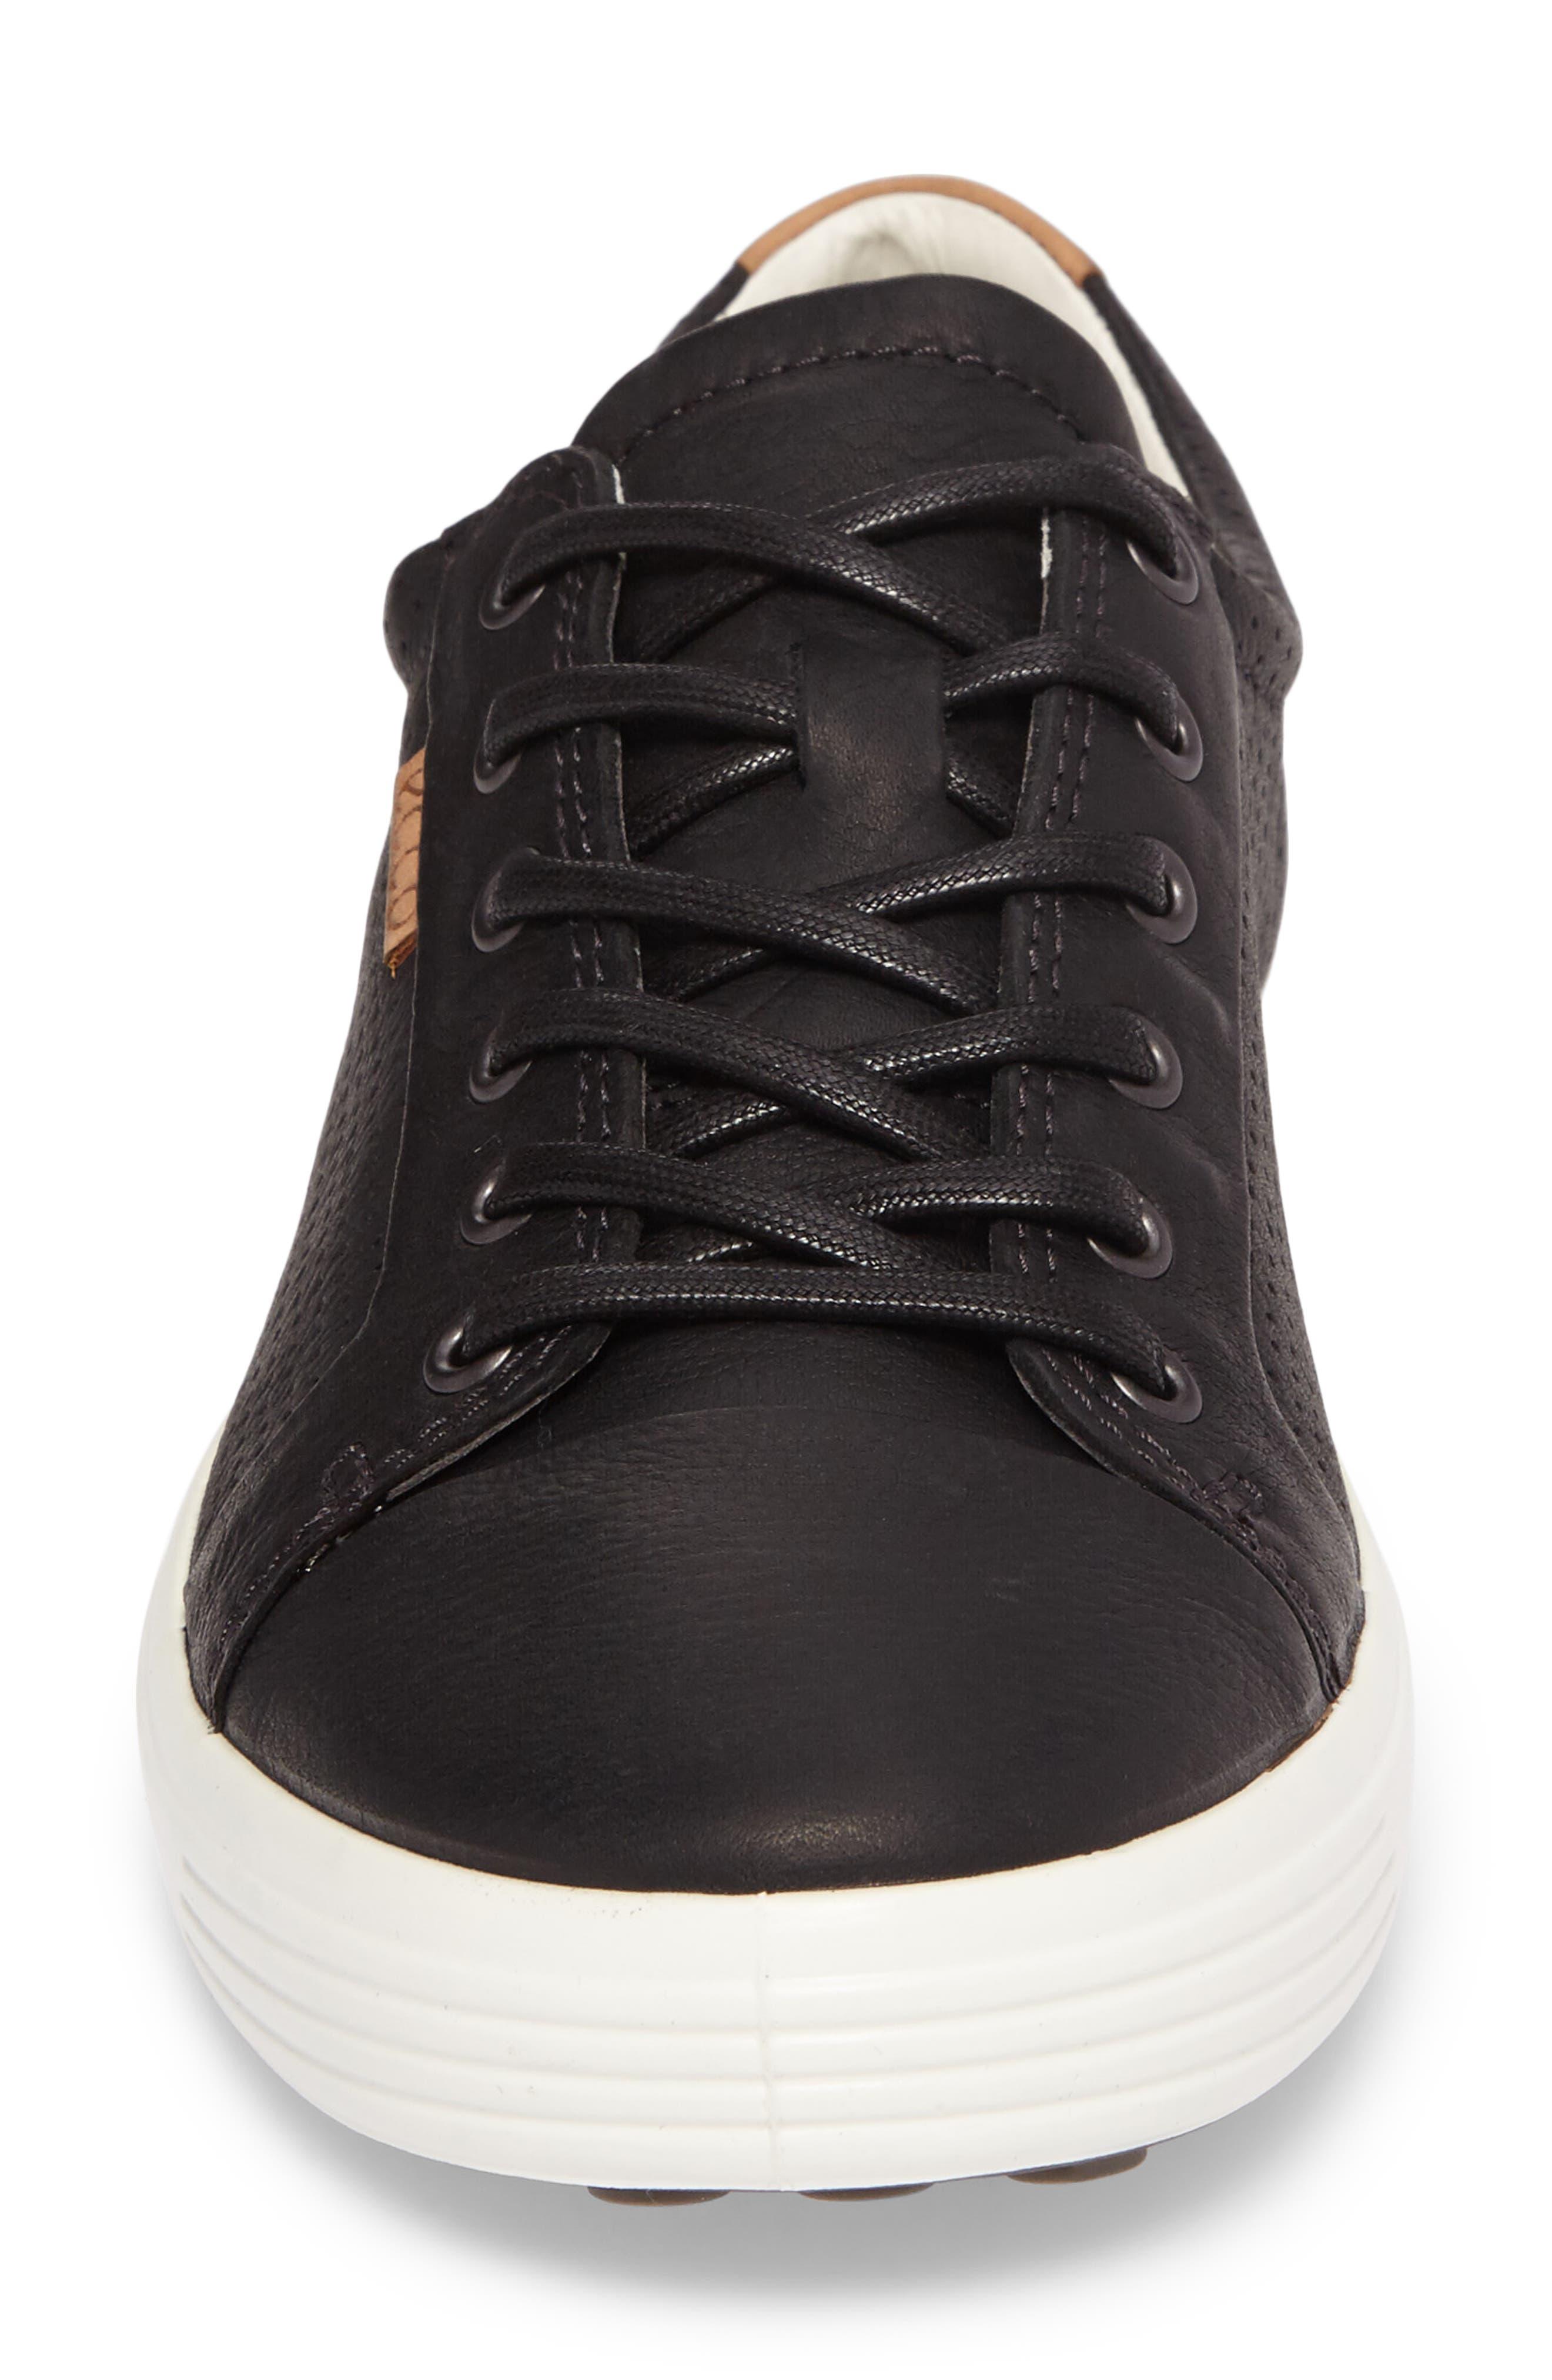 'Soft 7' Sneaker,                             Alternate thumbnail 4, color,                             BLACK LEATHER